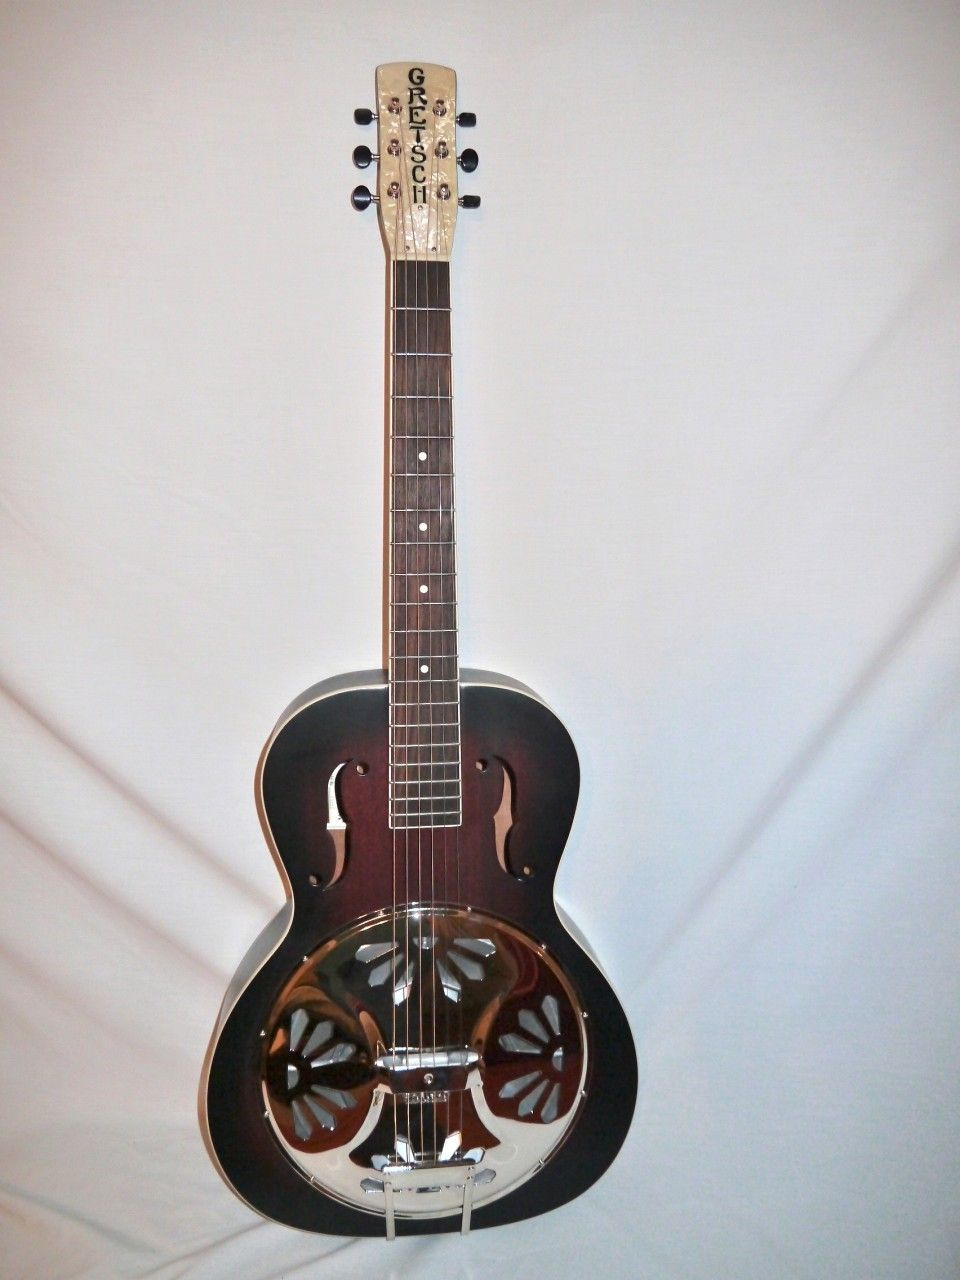 Indian Creek Guitars - Gretsch G9220 Bobtail Round-Neck Acoustic Electric Resonator,  (http://www.indiancreekguitars.com/gretsch-g9220-bobtail-round-neck-acoustic-electric-resonator/)